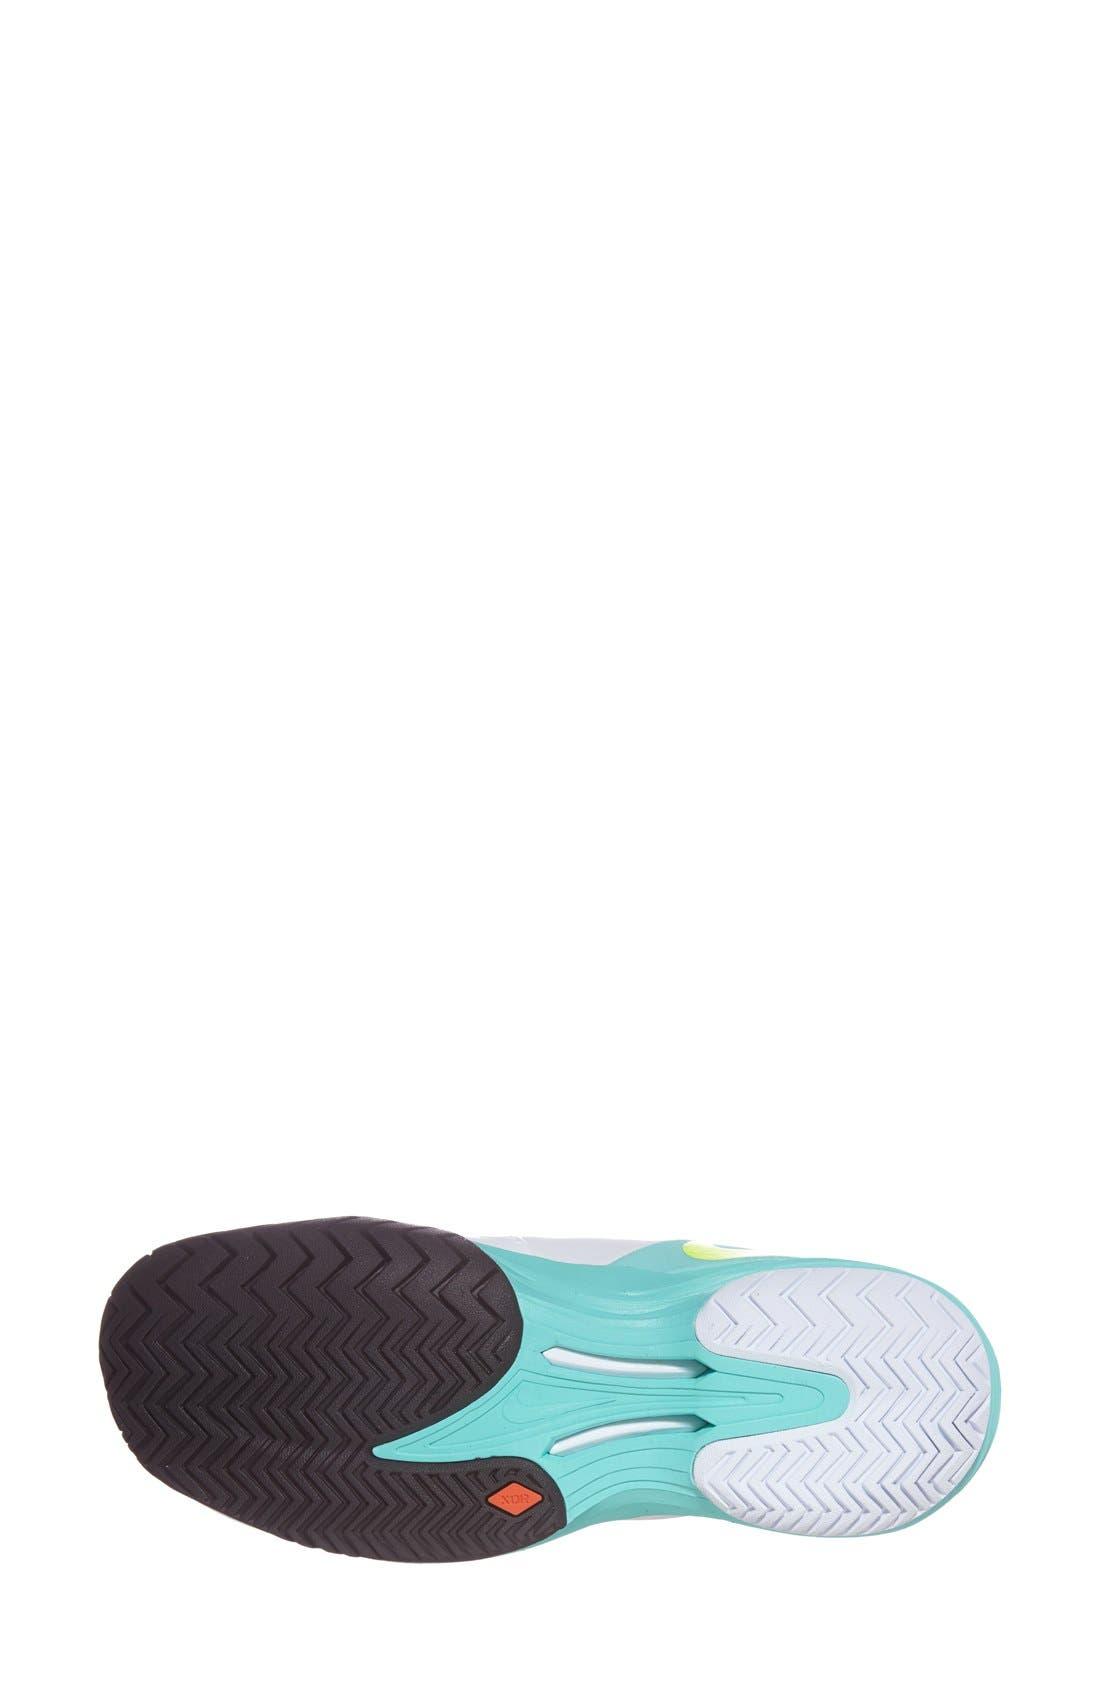 Alternate Image 4  - Nike 'Lunar Ballistec' Tennis Shoe (Women)